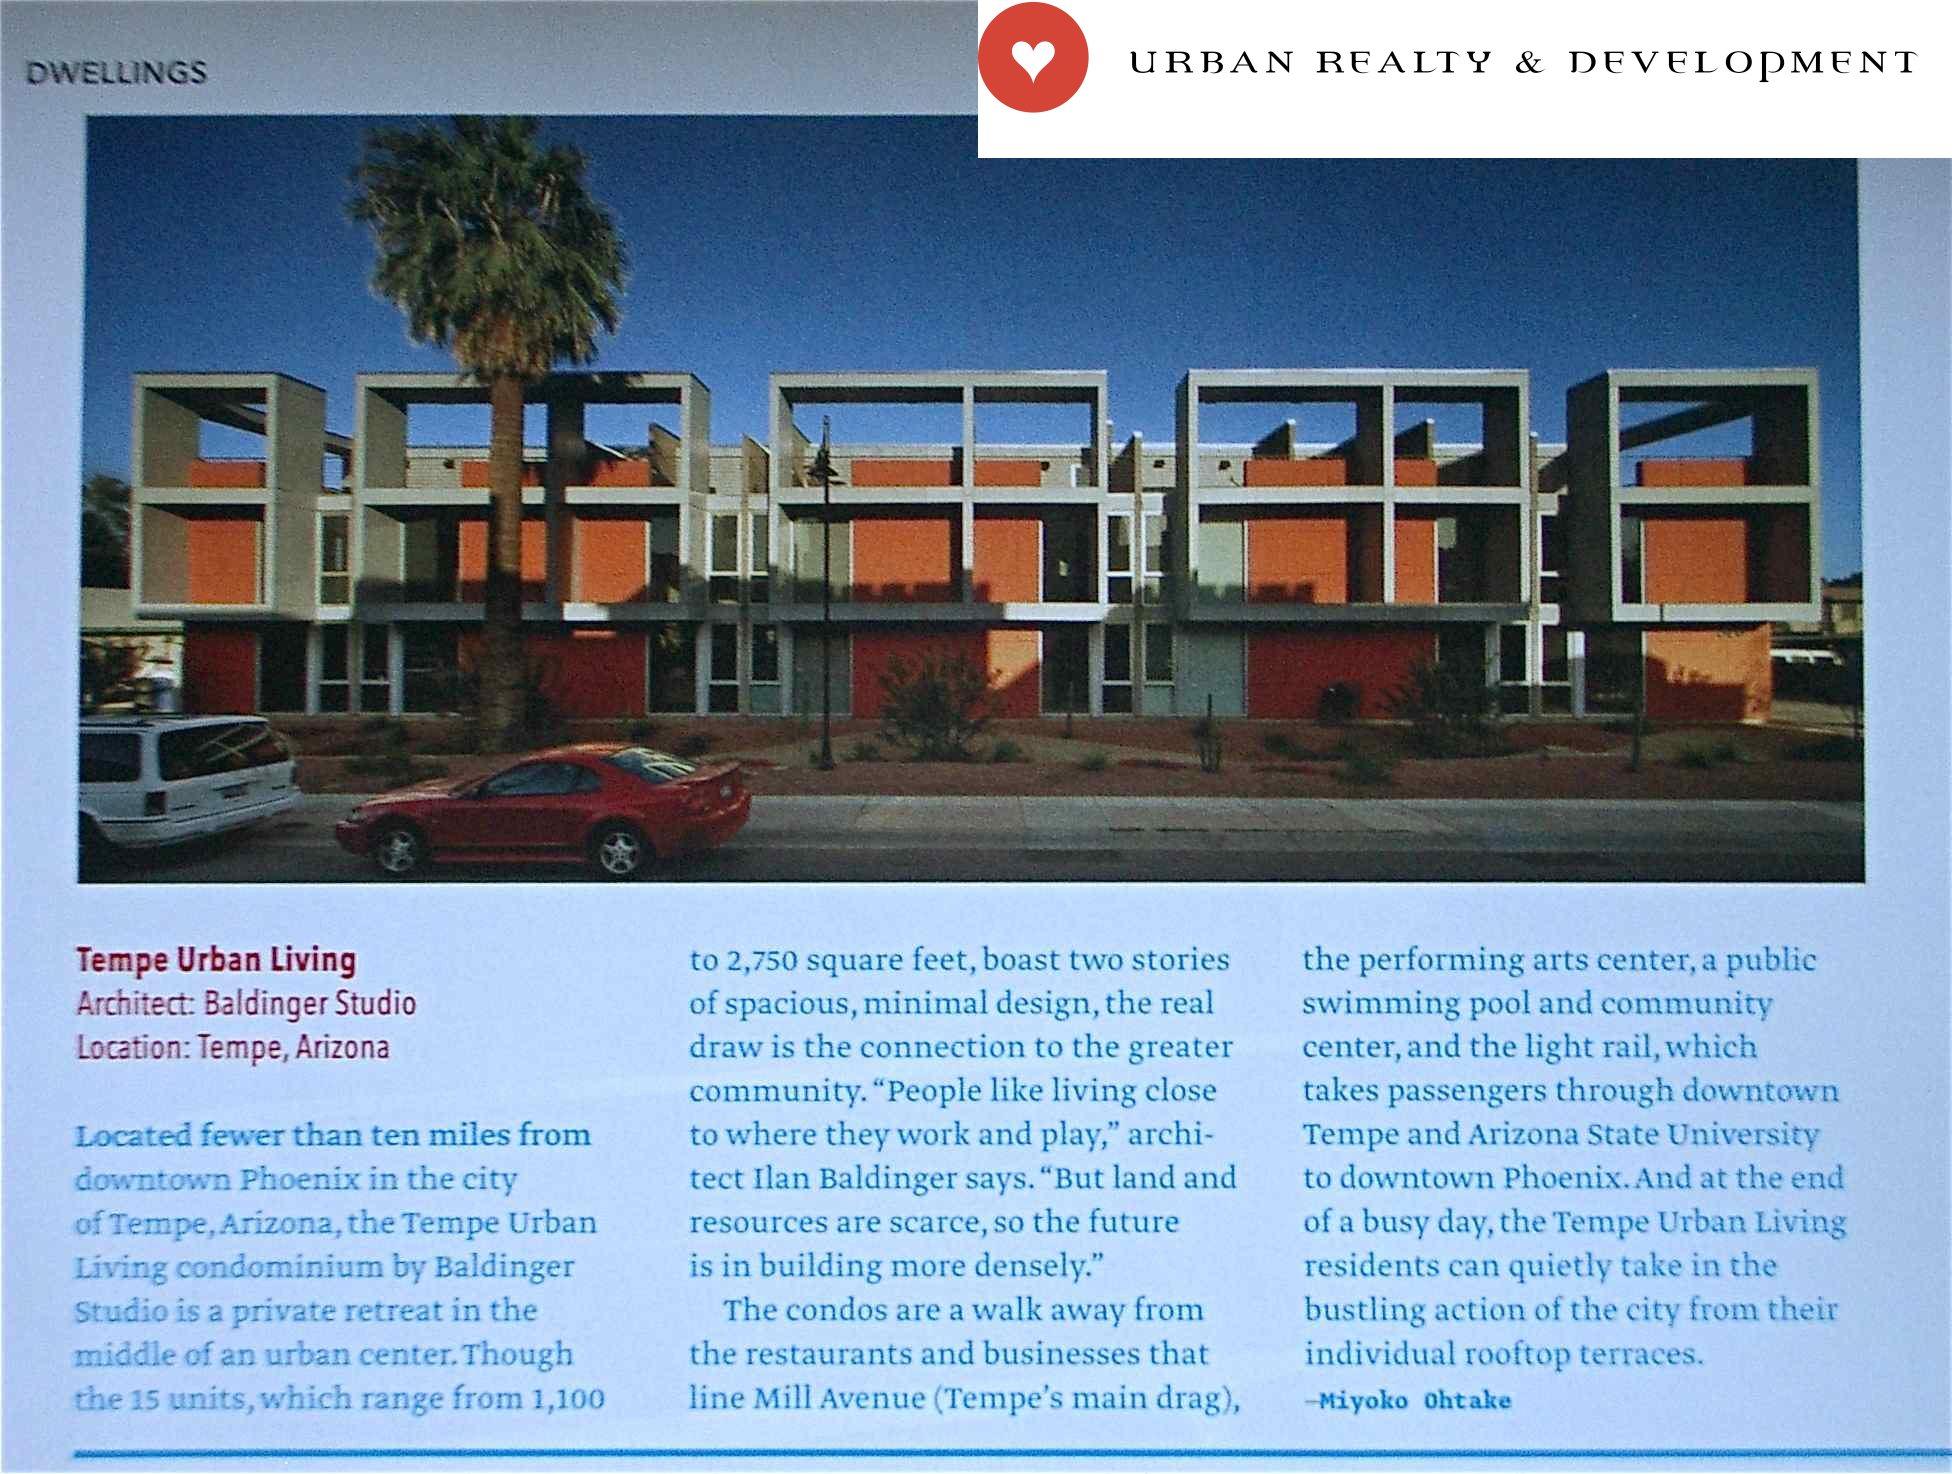 Tempe Urban Living In Dwell Magazine